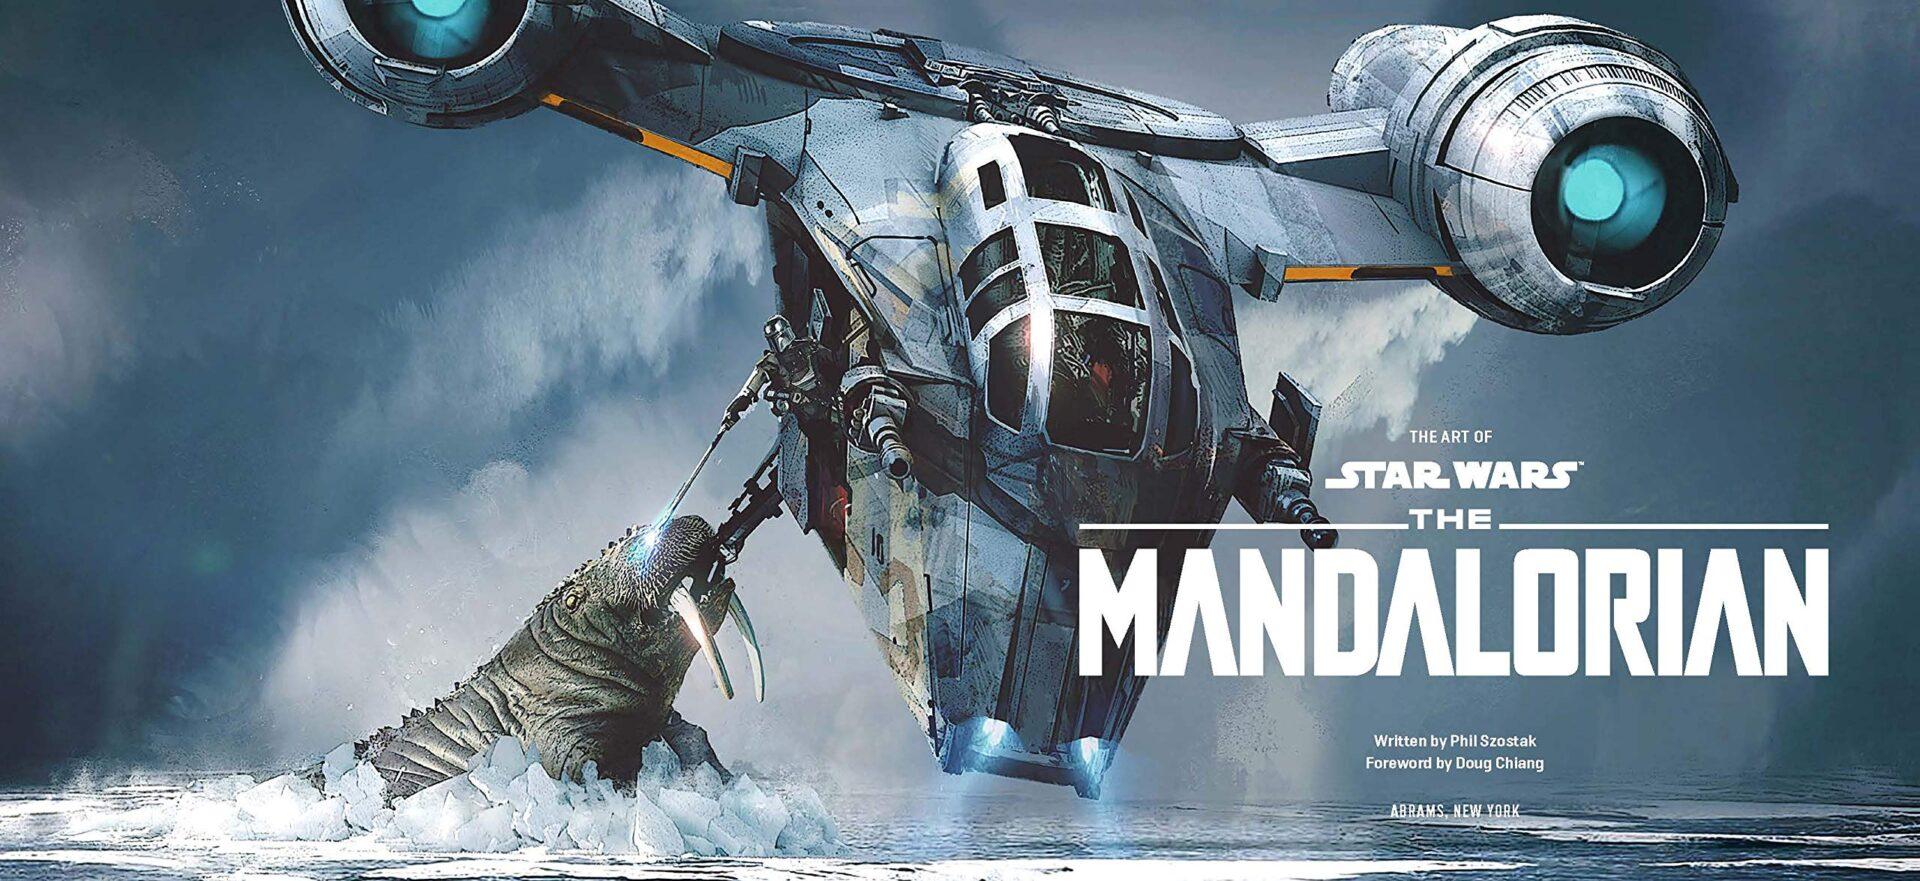 The Art of Star Wars: The Mandalorian | Art Book